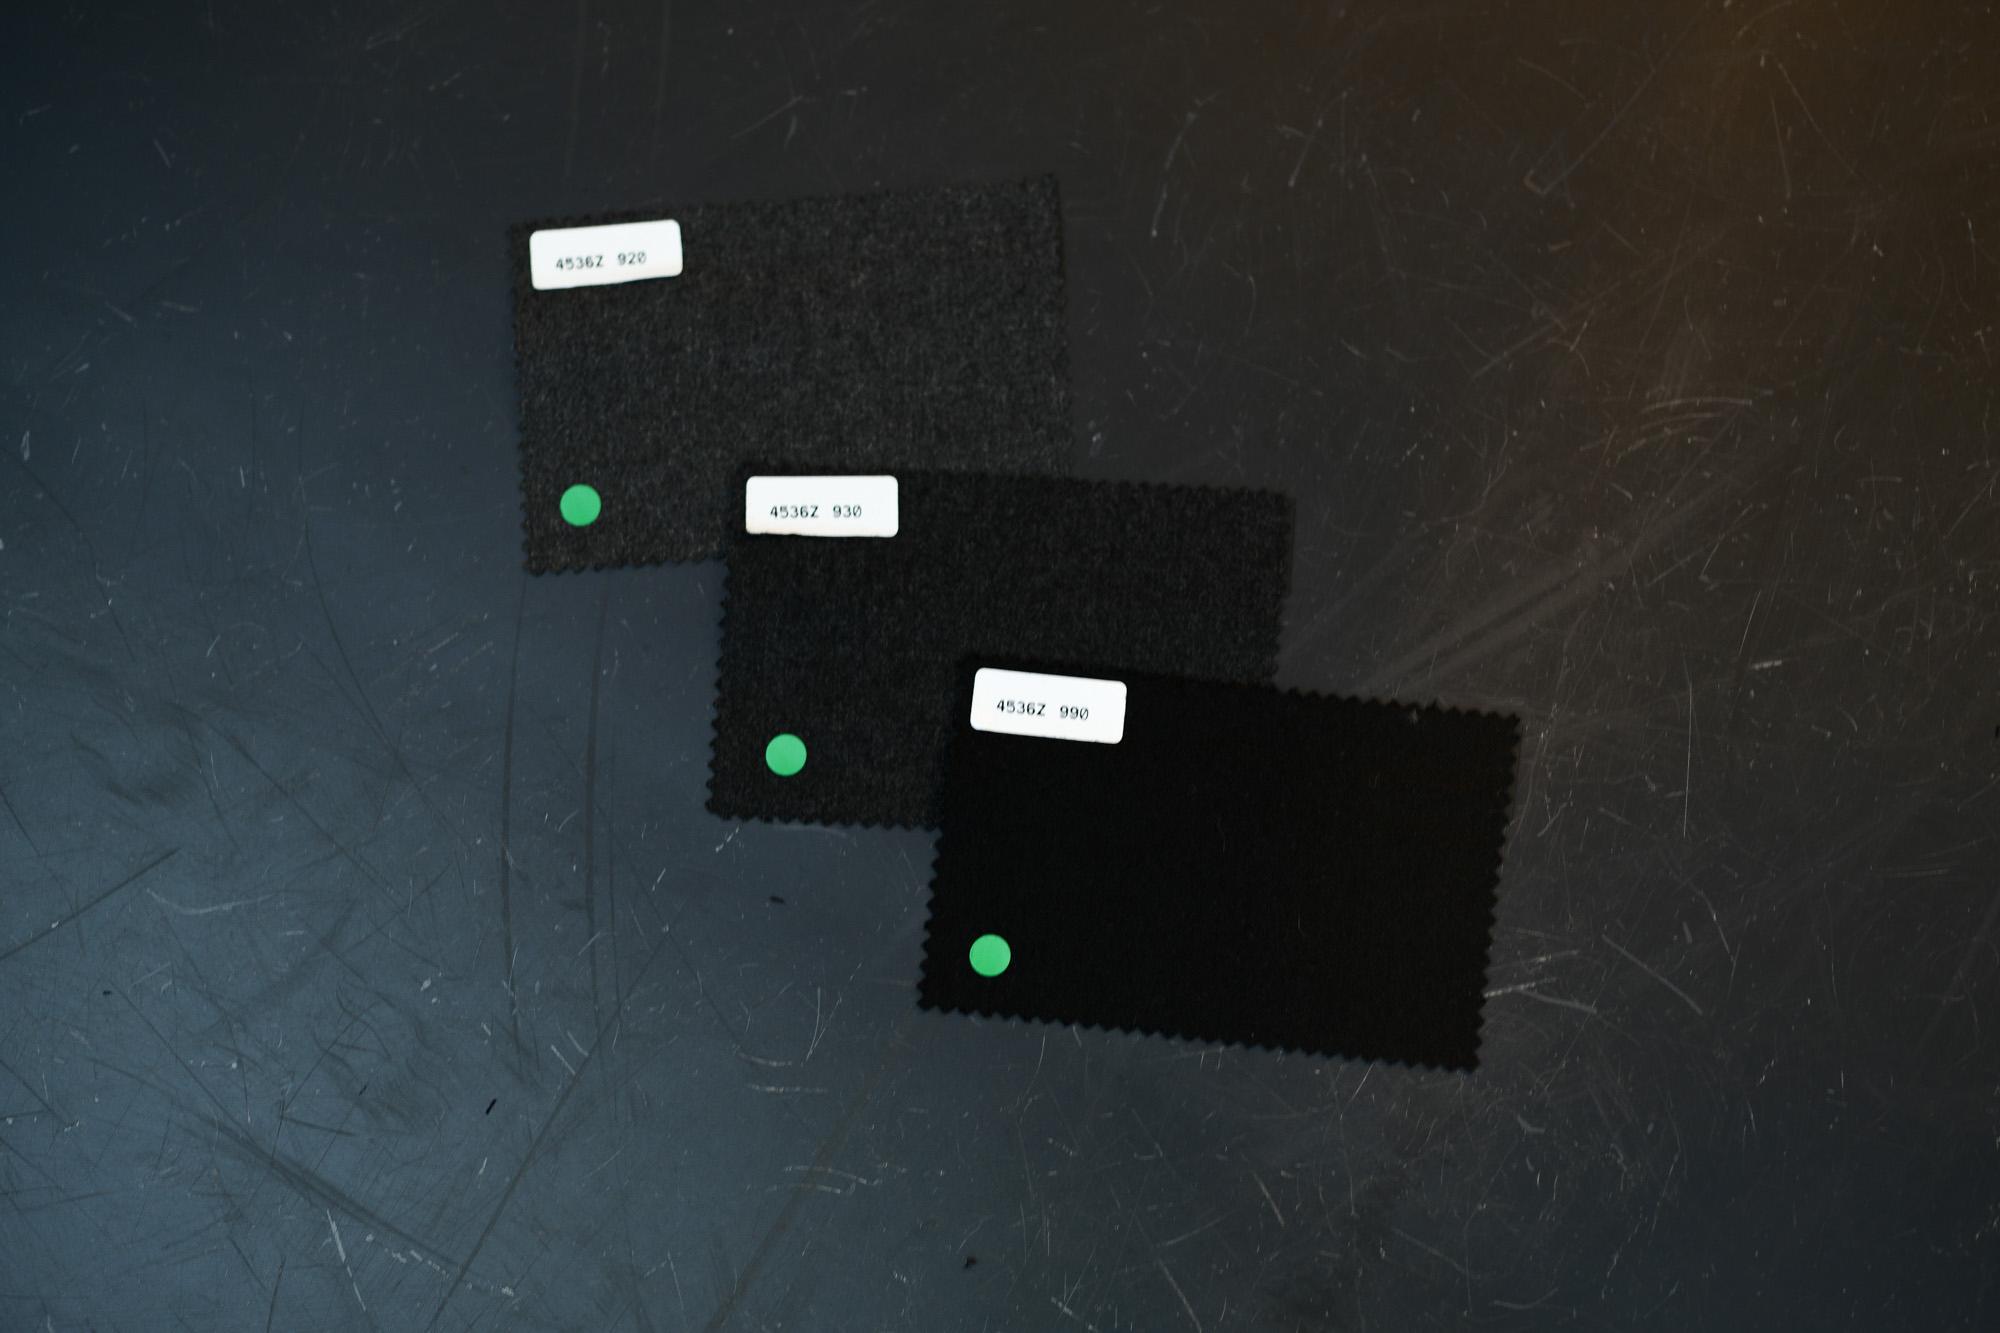 INCOTEX / インコテックス (2020 秋冬 プレ 展示会) 愛知 名古屋 altoediritto アルトエデリット スラックス グレスラ ブラックスラックス ブラウンスラックス N35 ノープリーツ